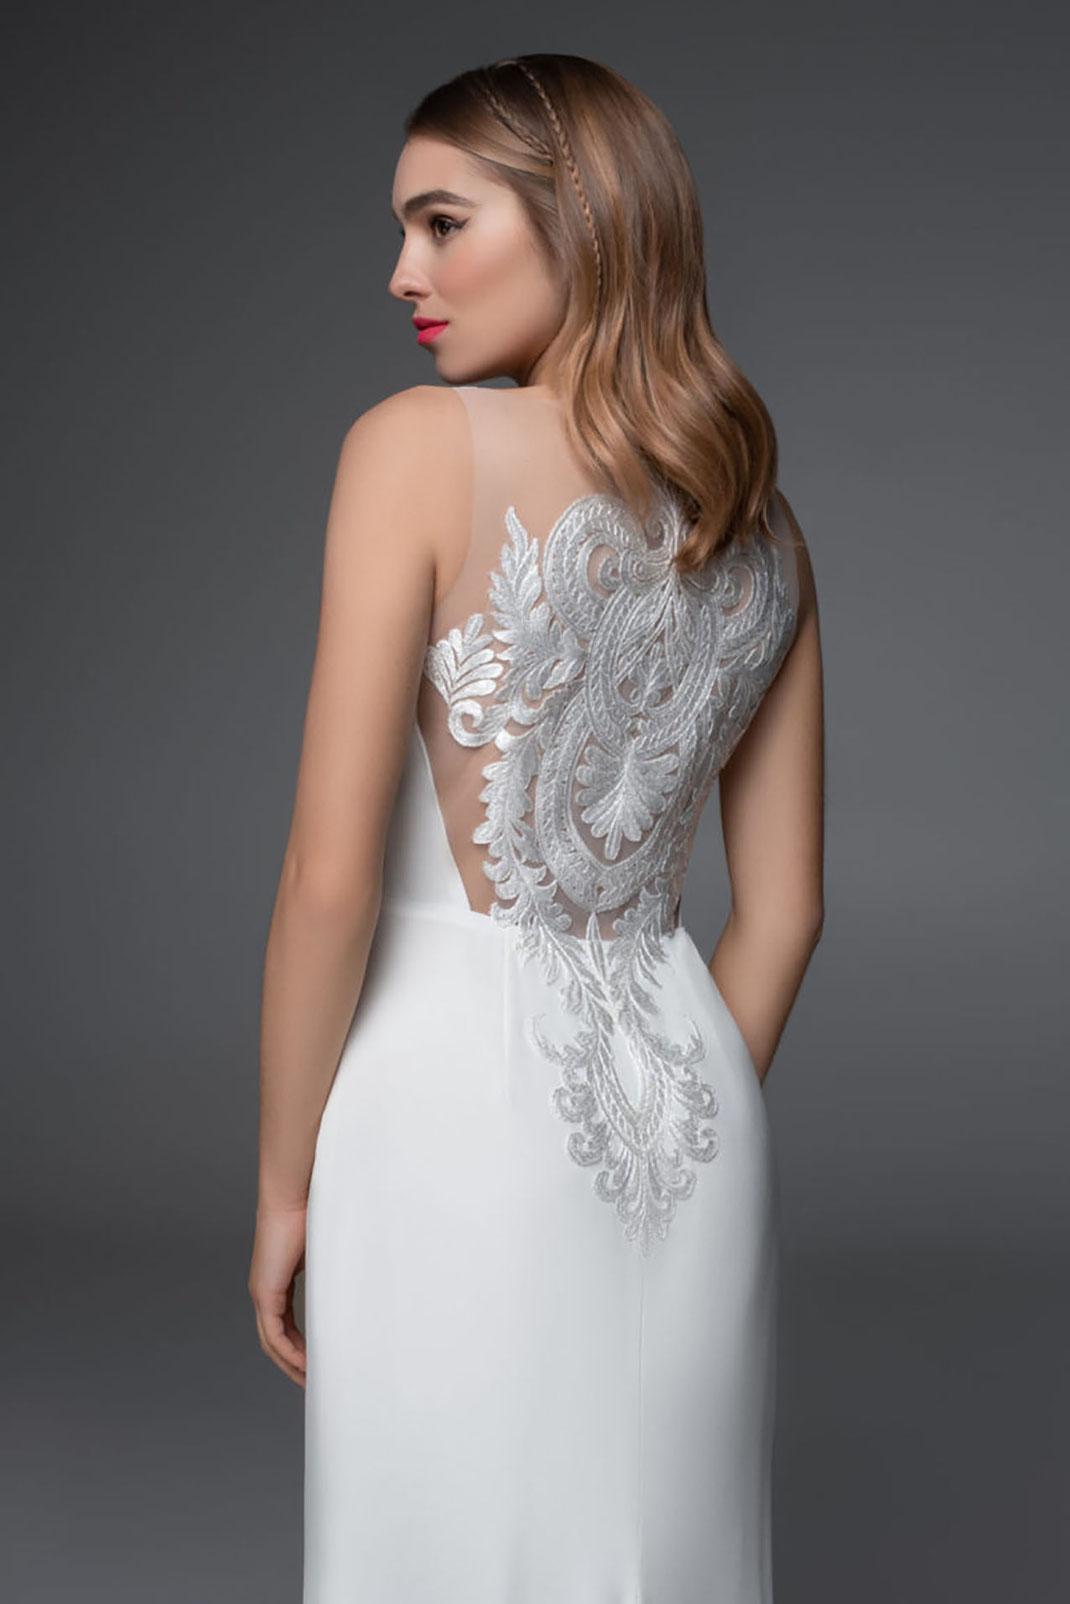 Brautkleider der Sadoni Kollektion 2022